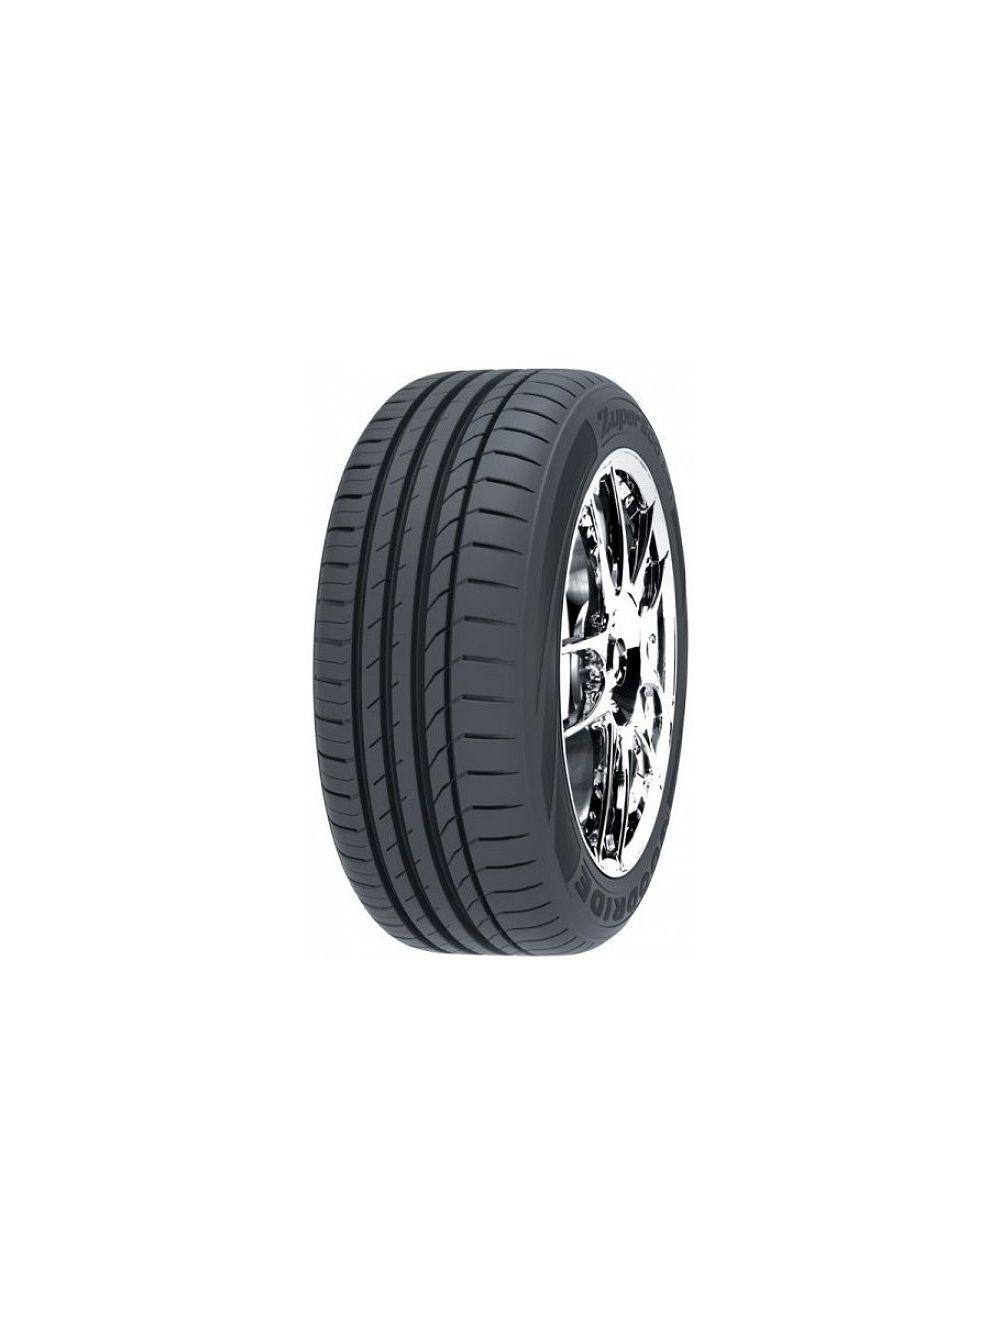 Goodride 215/60R16 V Z107 XL Nyári gumi